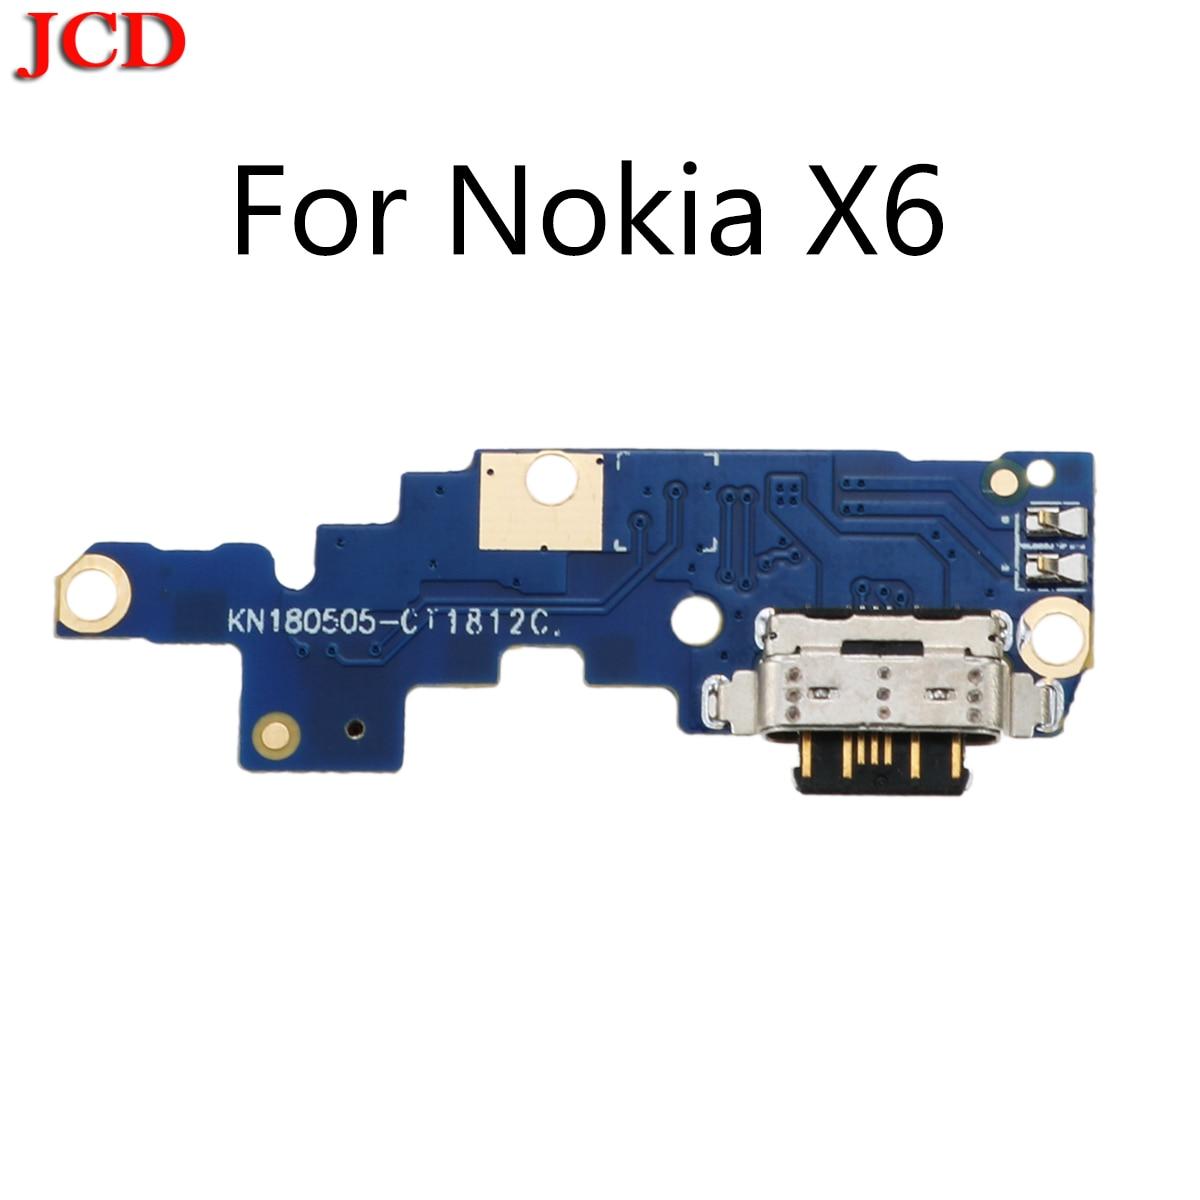 JCD nuevo para Nokia X6/6,1 Plus TA-1099/1103 tipo C cargador de puerto de carga USB conector de antena de base Mic Flex Cable placa de circuito